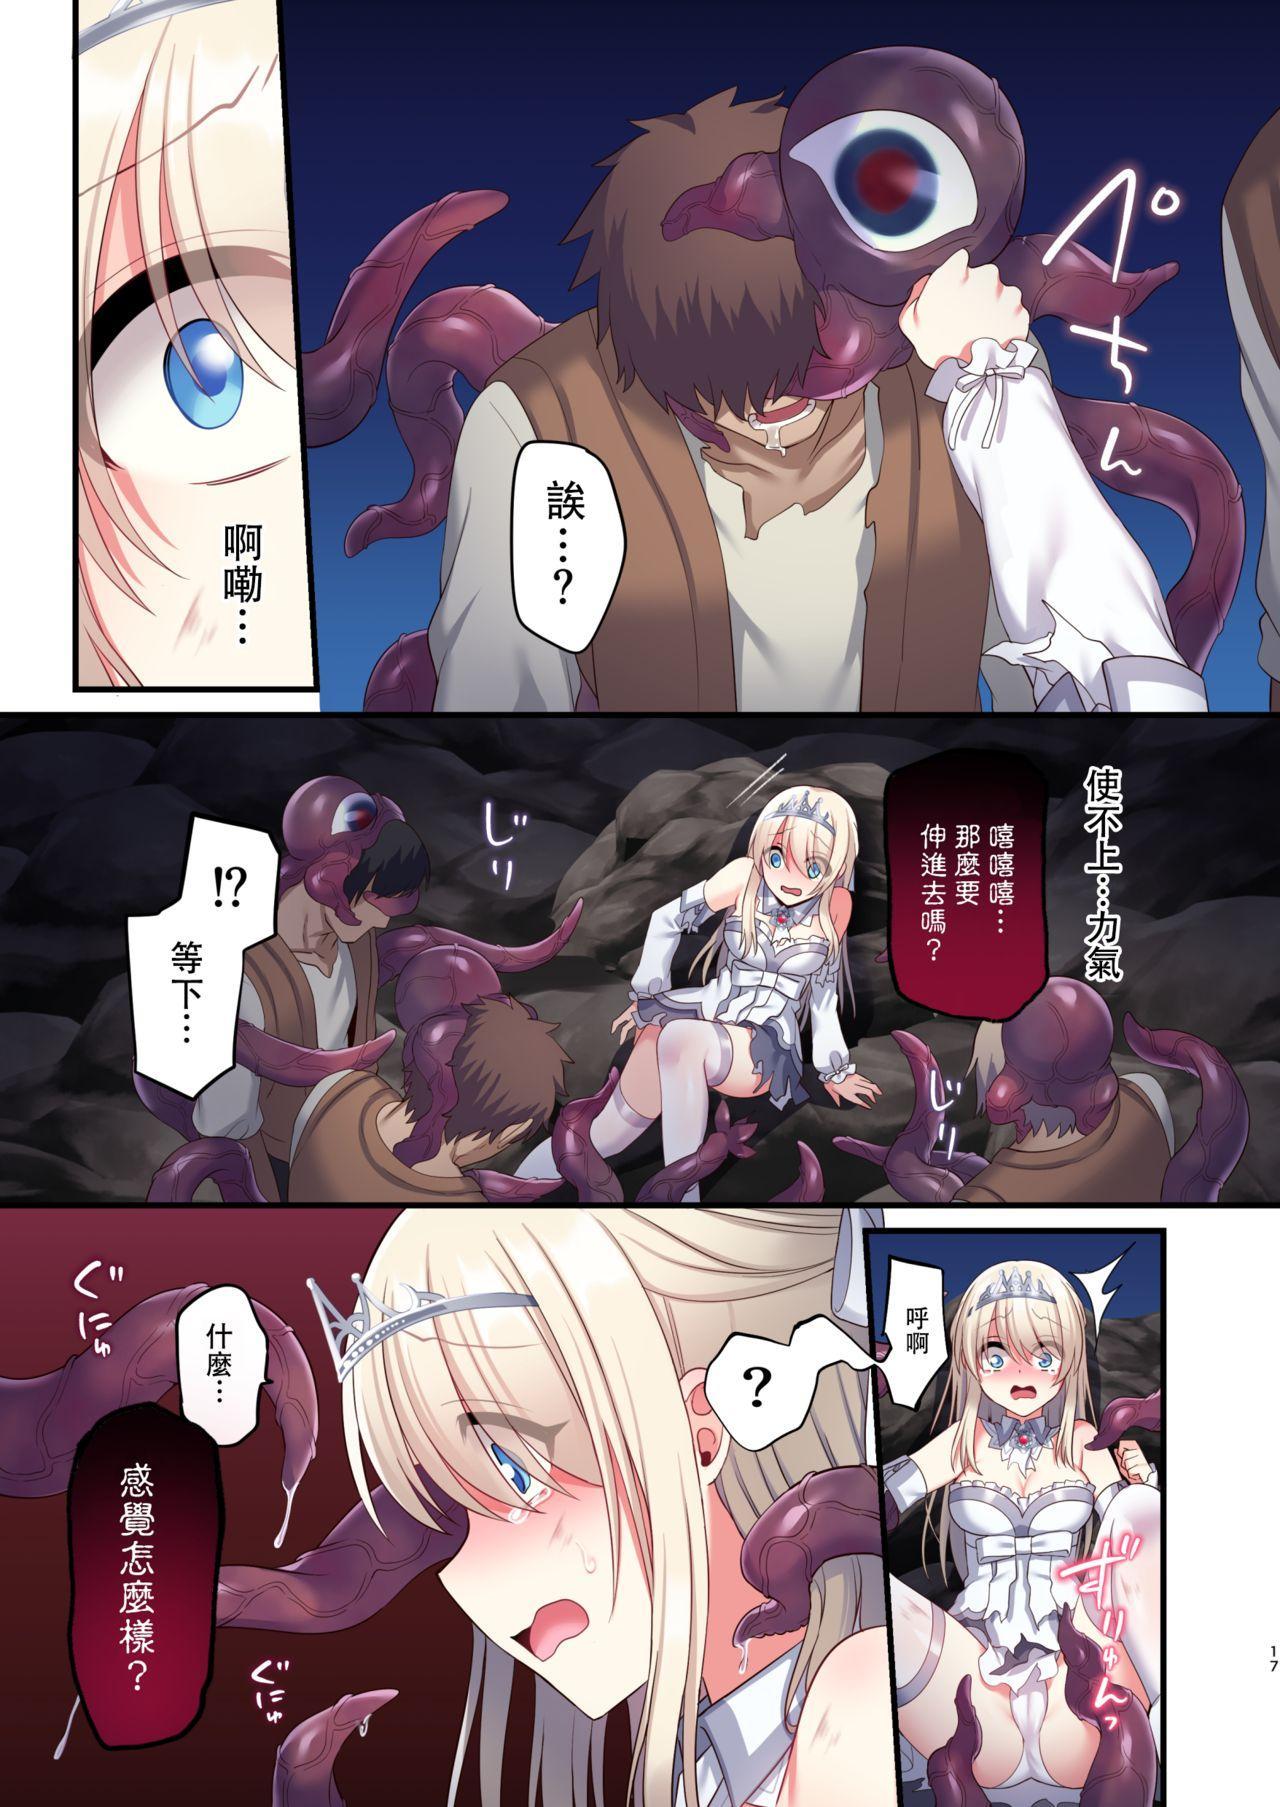 Noroi no Yubiwa de Game Over + Omake CG 17